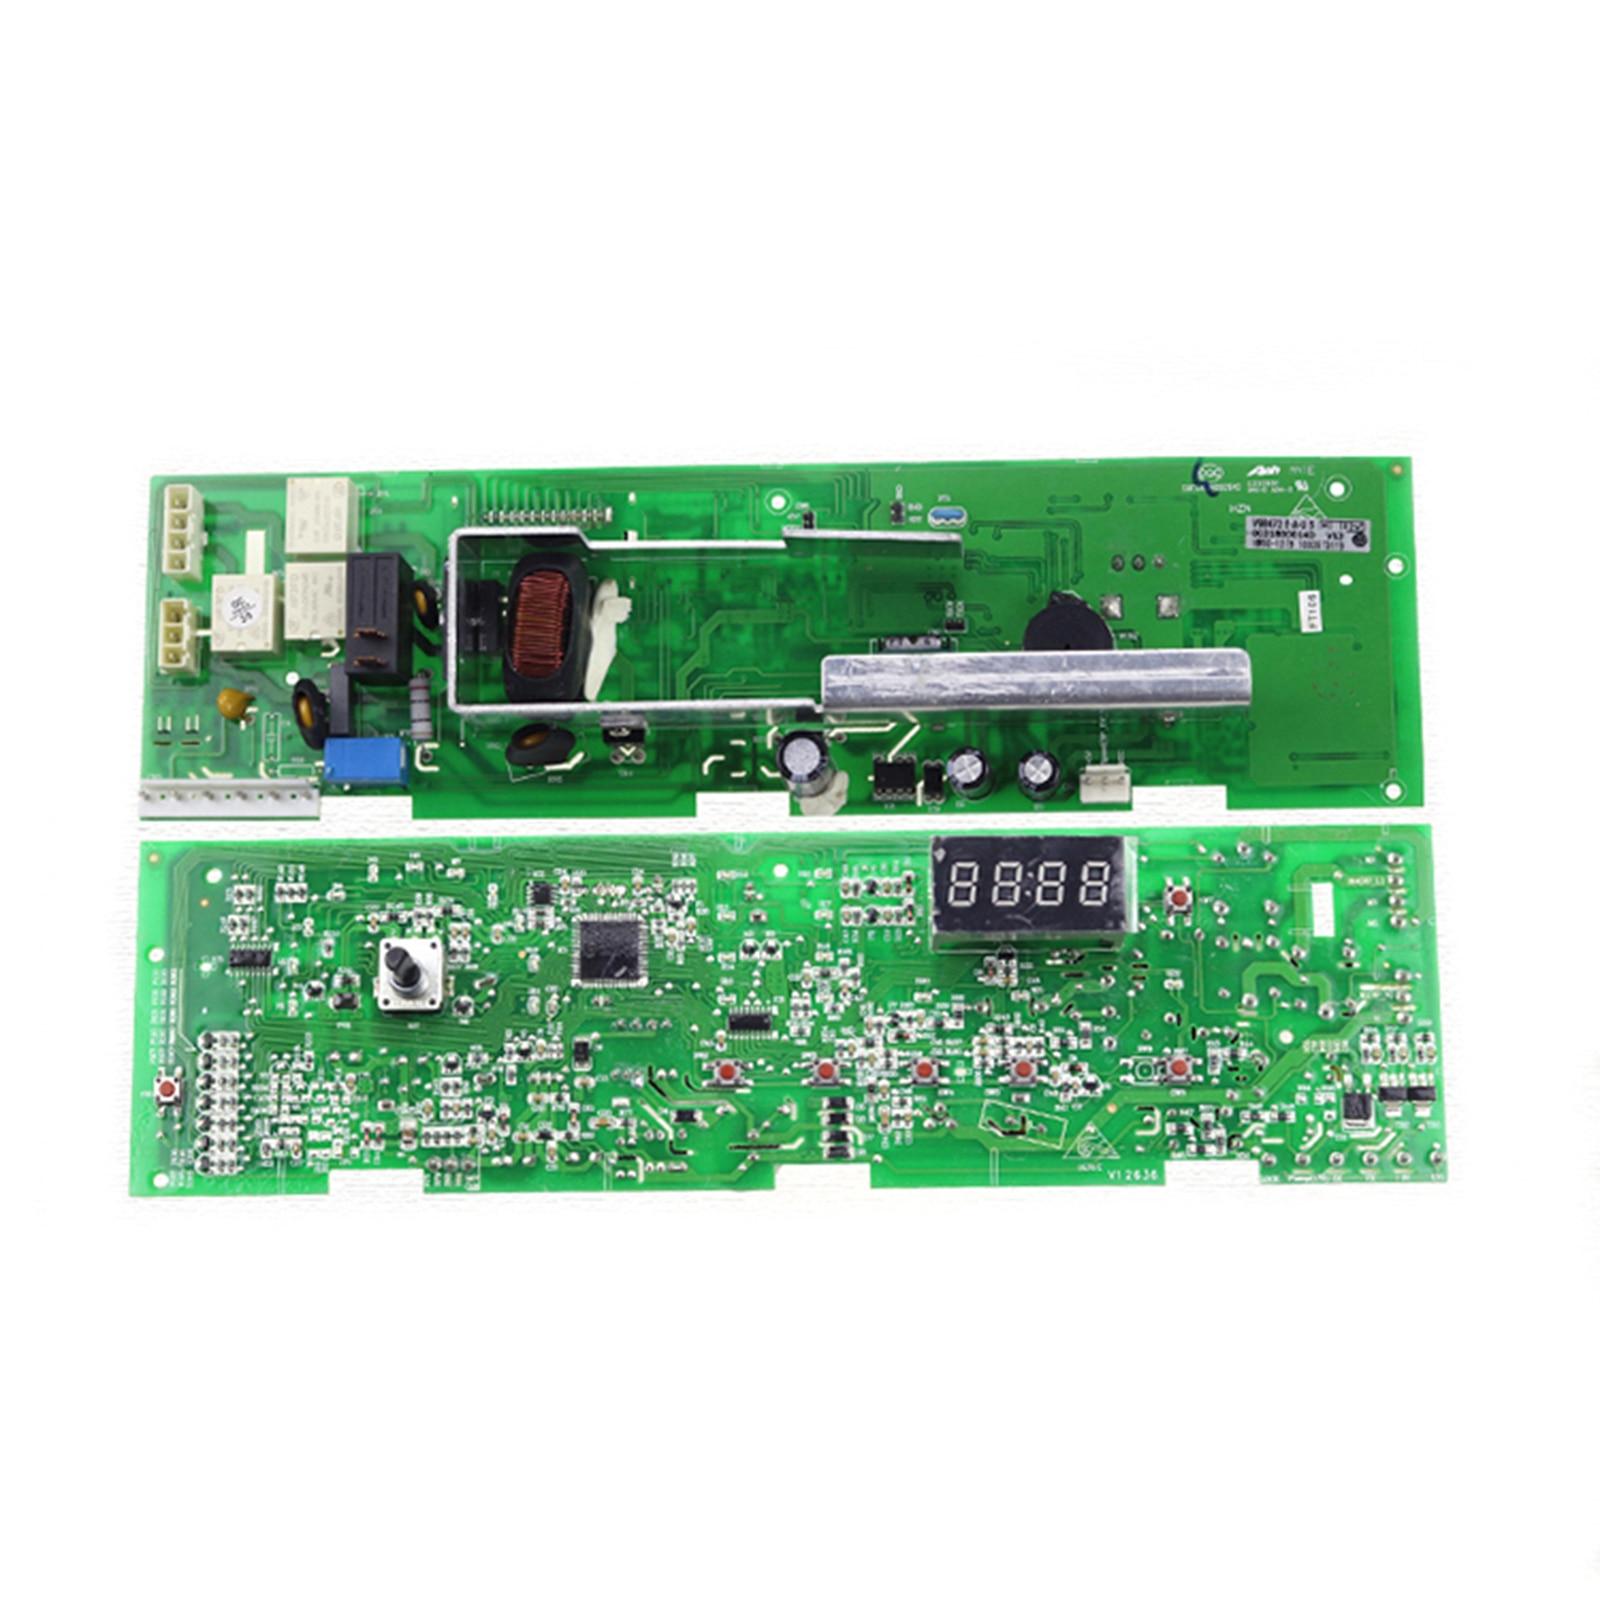 Computer Board PCB Board 0021800015A For Haier Drum Washing Machine XQG60-1000 / 1000J / 812AMTLM / 1012AMTLM